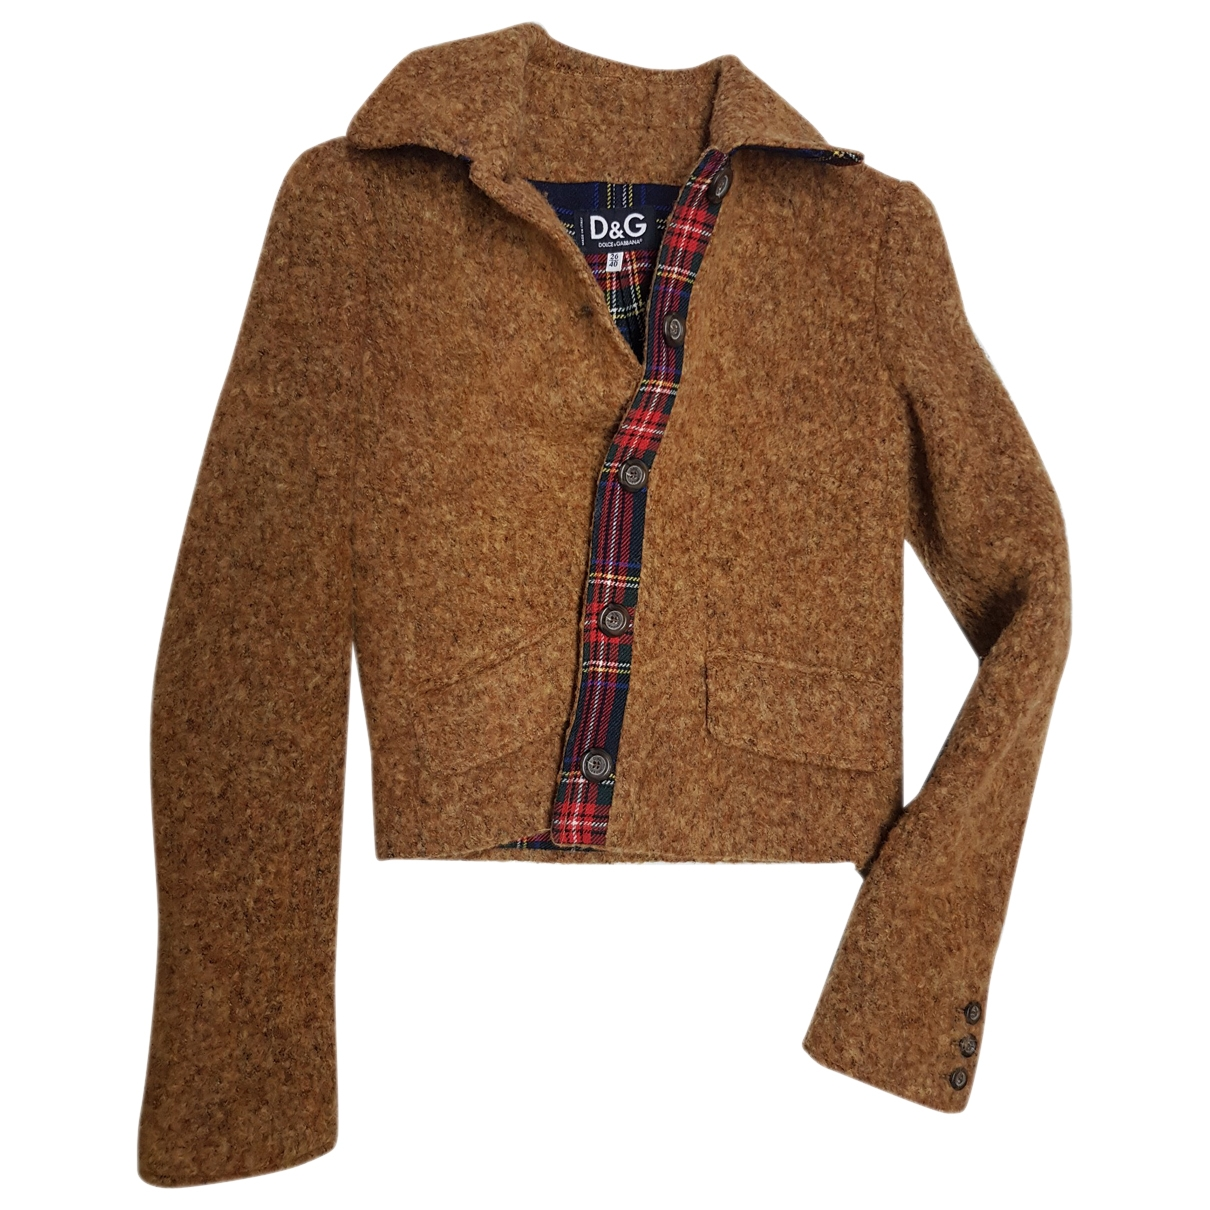 D&g \N Brown Cotton jacket for Women 34 FR